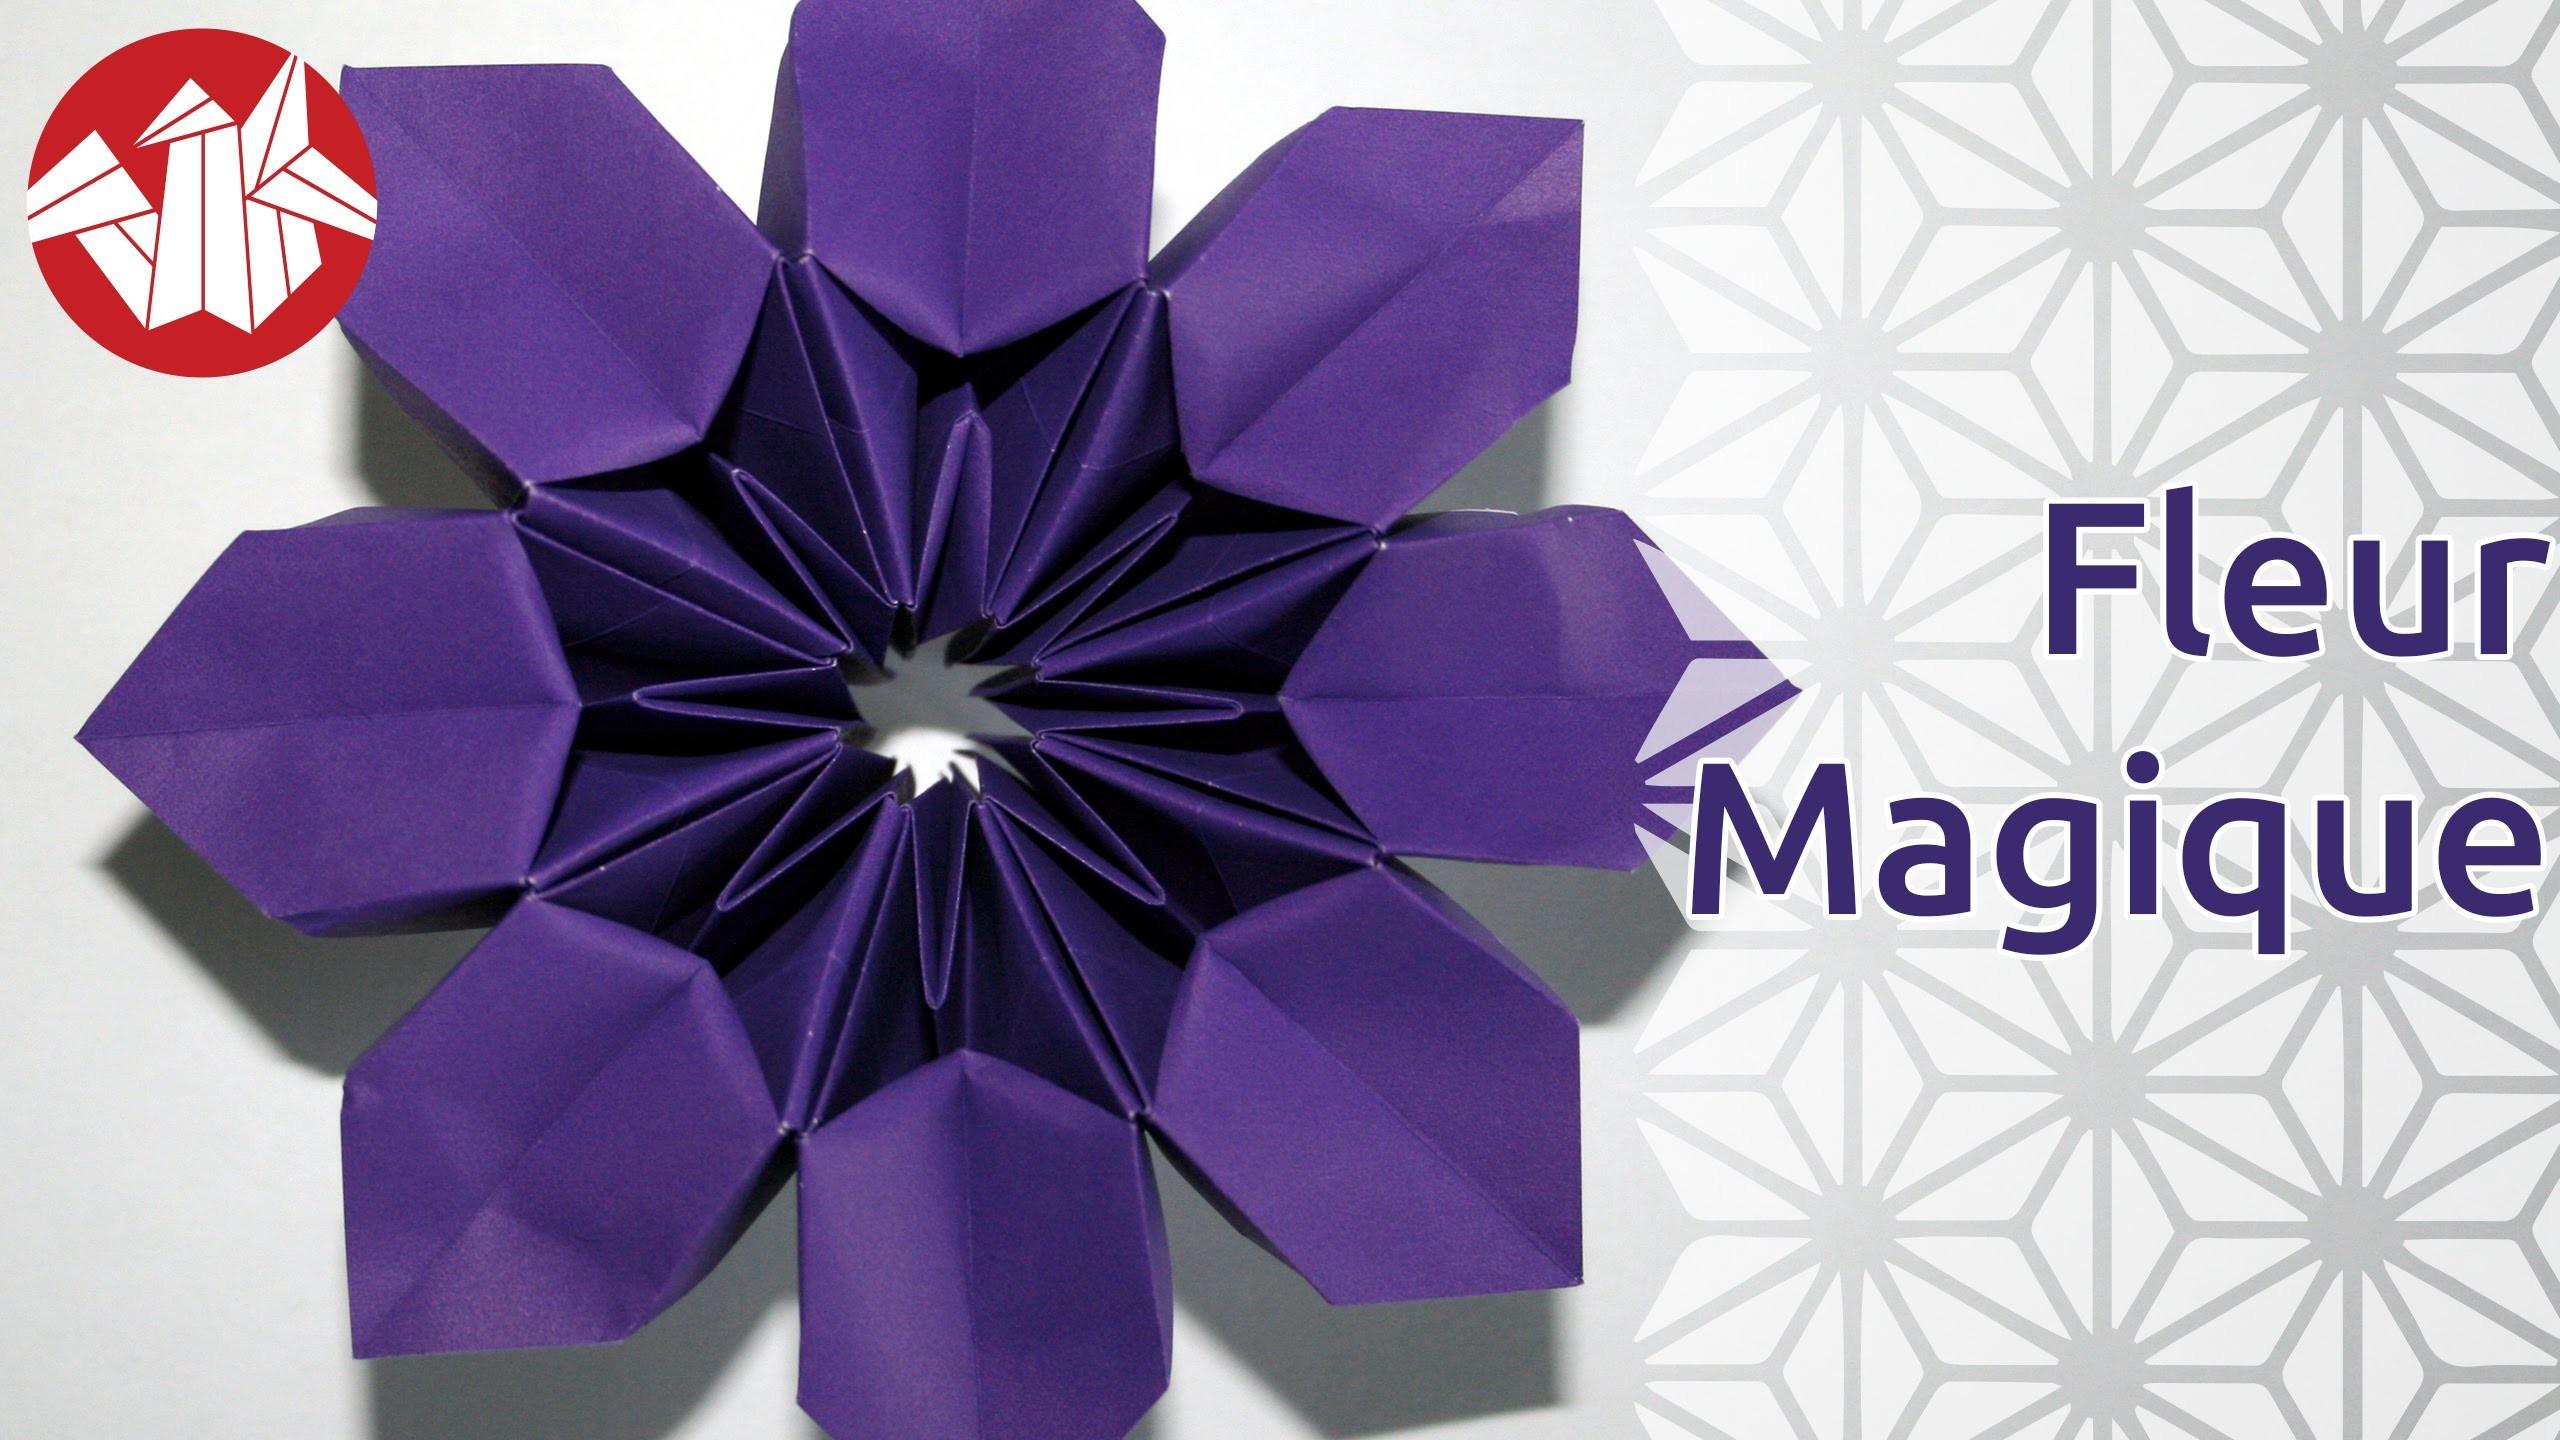 Origami - Fleur Magique - Magic Flower [Senbazuru]